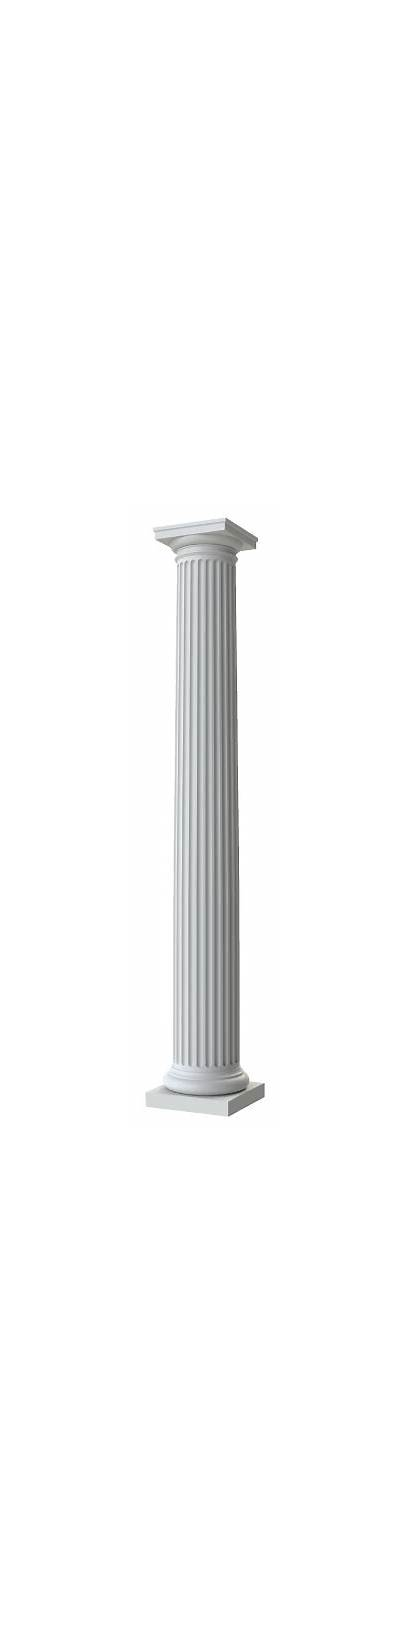 Round Fluted Columns Tapered Fiberglass Exterior Interior